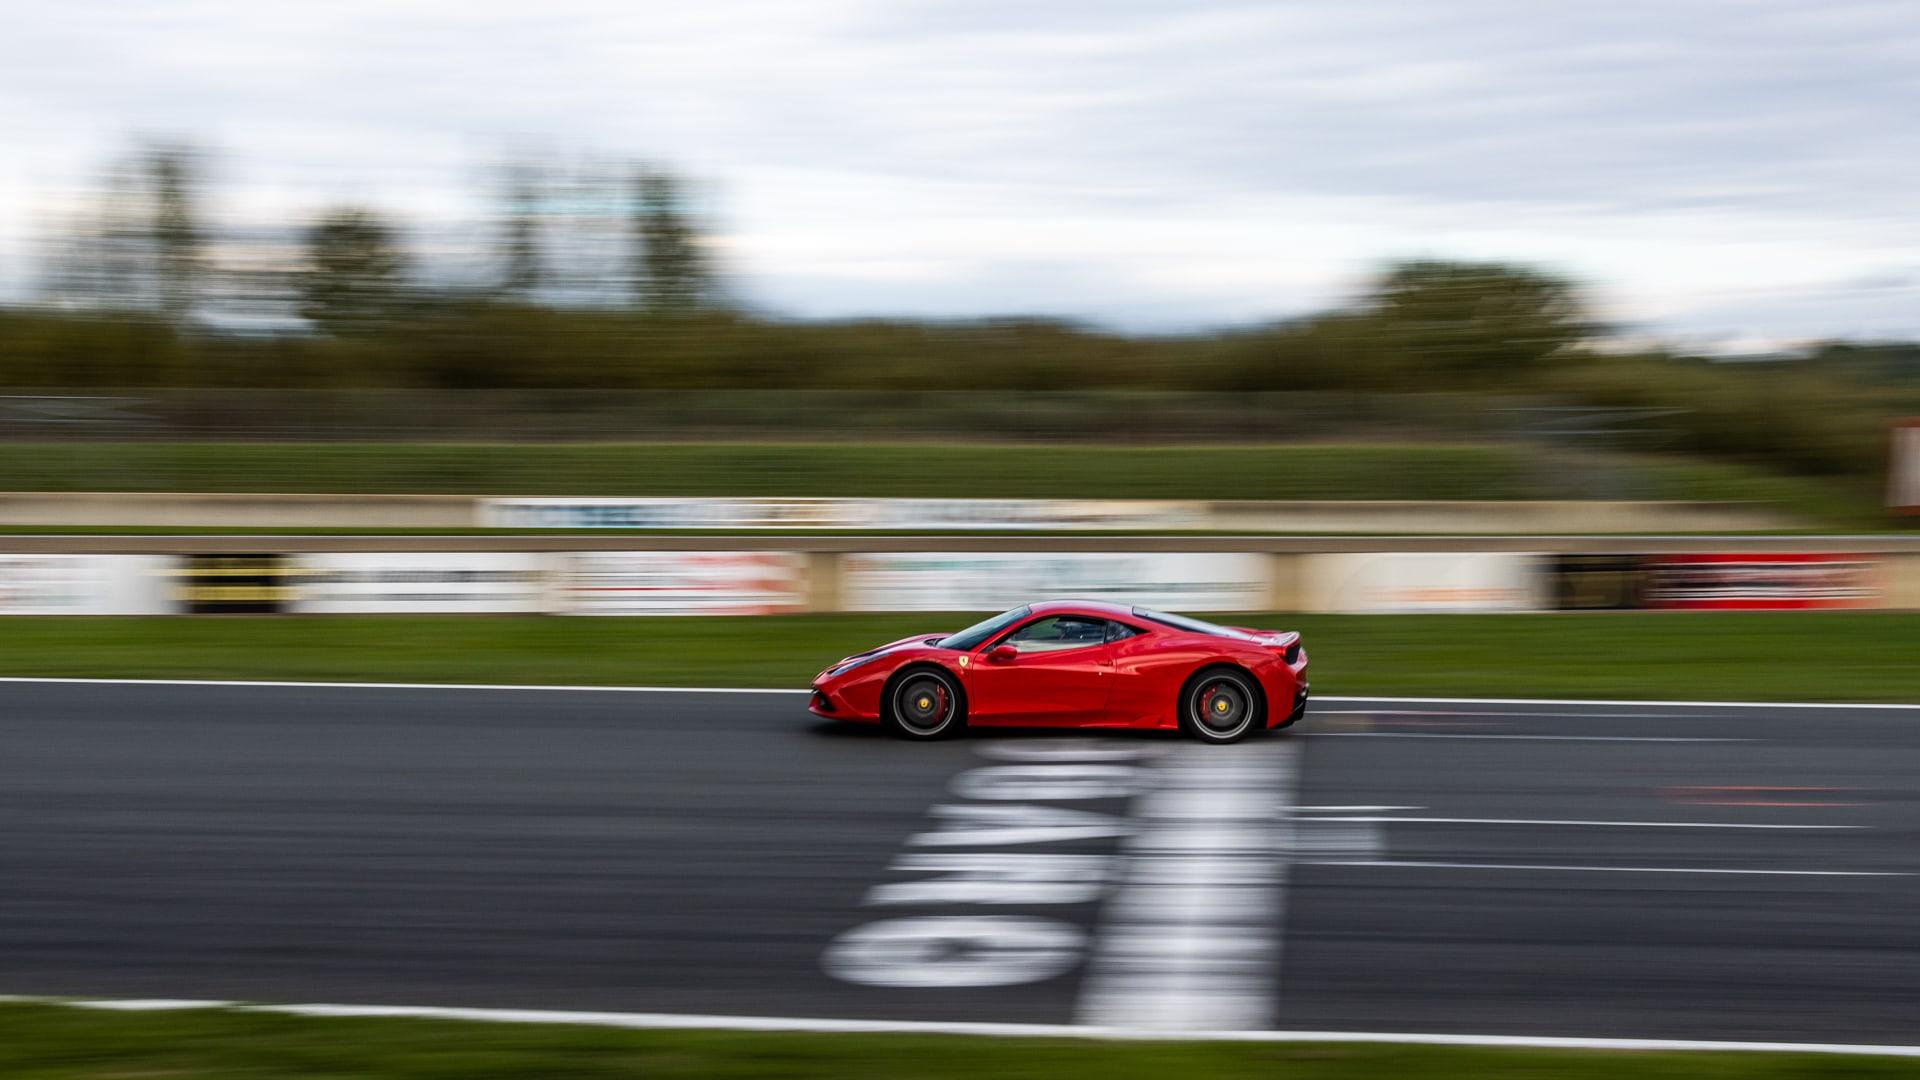 Race 458 speciale